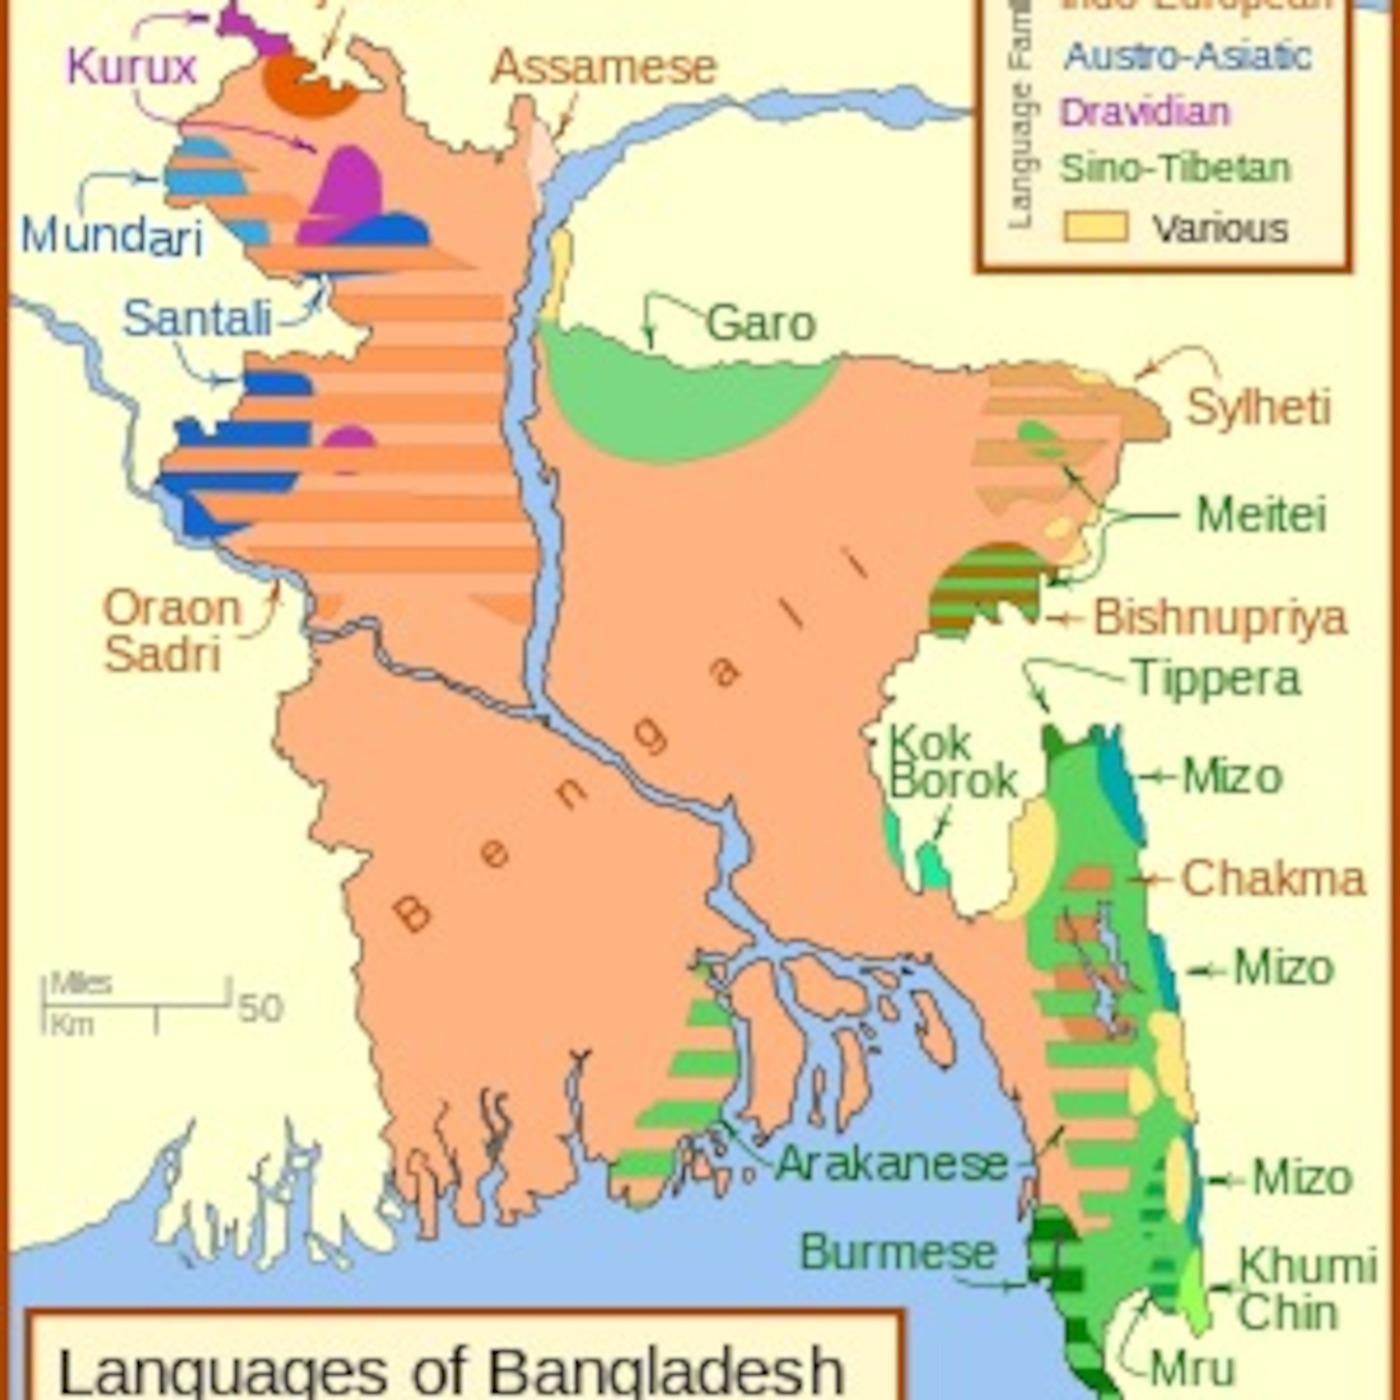 Major Languages of Bangladesh(According to English Alphabets)-(Gospel Songs, Good News,Words of Life)/মেজর ভাষাসমূহ বাংলাদেশ (অনুসারে ইংরেজি বর্ণমালা) - (ধর্মবাণী সংস, ভালো সংবাদ, লাইফ শব্দ)